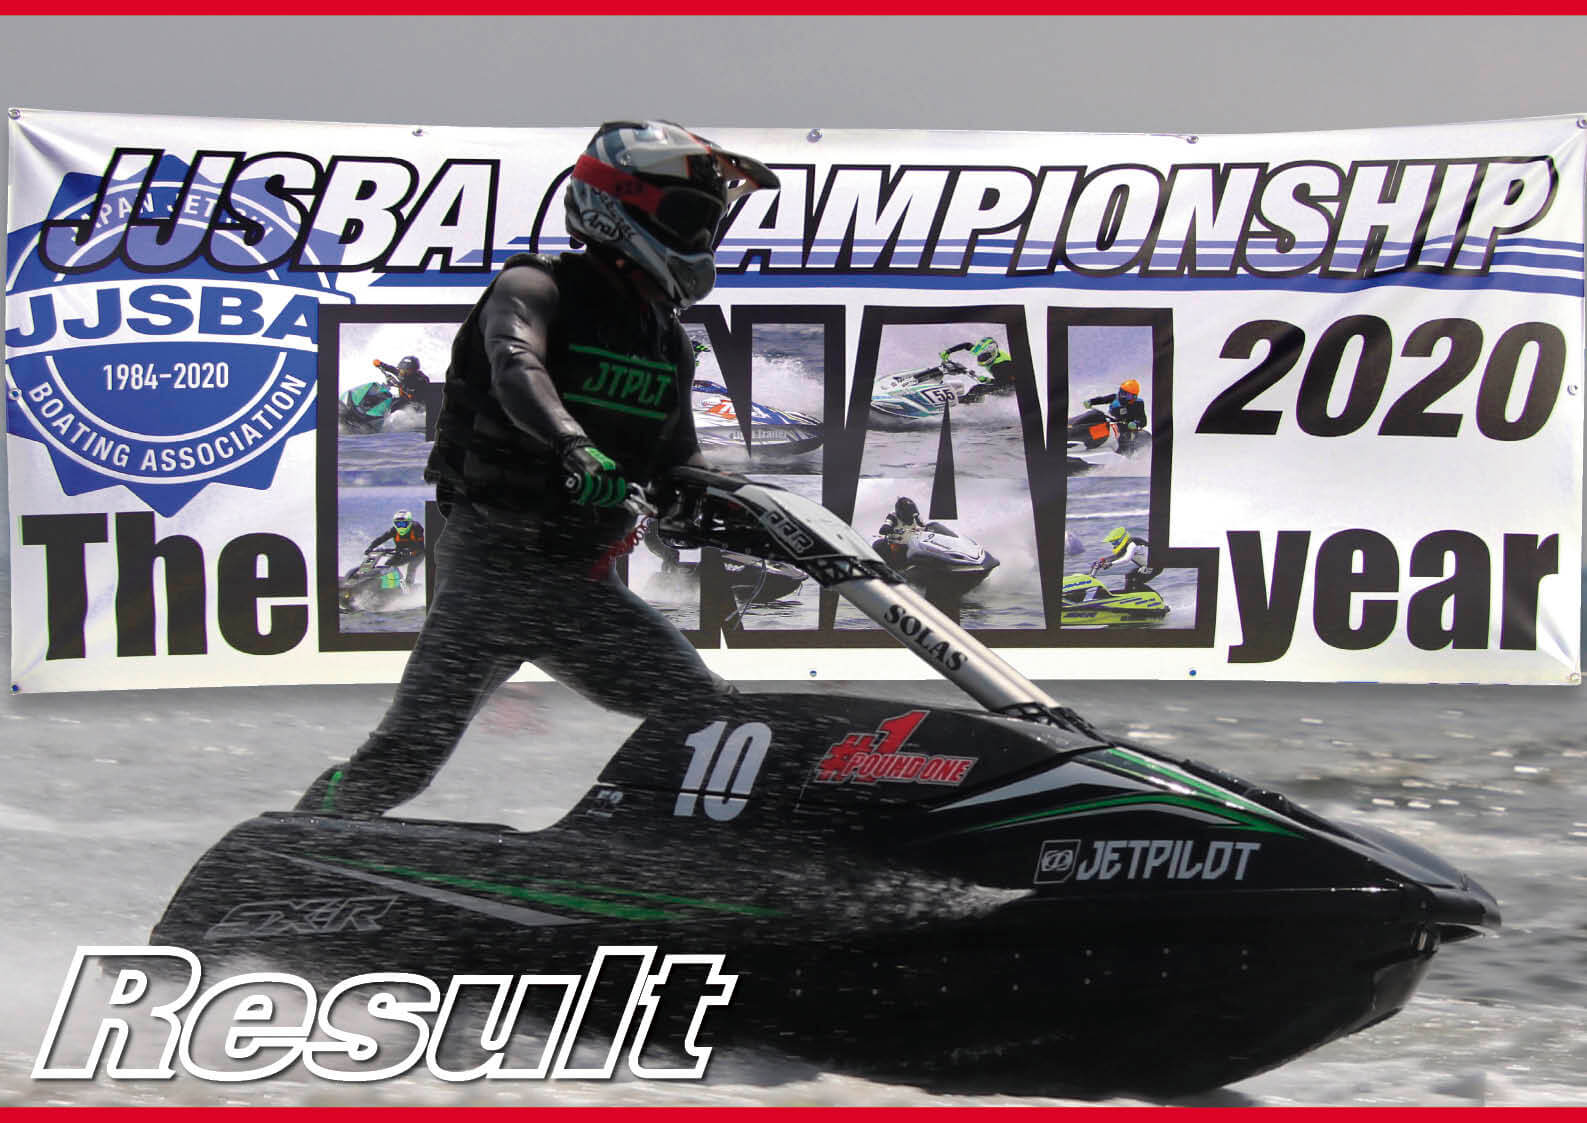 「Result」JJSBA 「THE LAST CHAMPIONSHIP」カワサキのワンメイクレース R-1、R-2のレース結果 ジェットスキー(水上バイク)